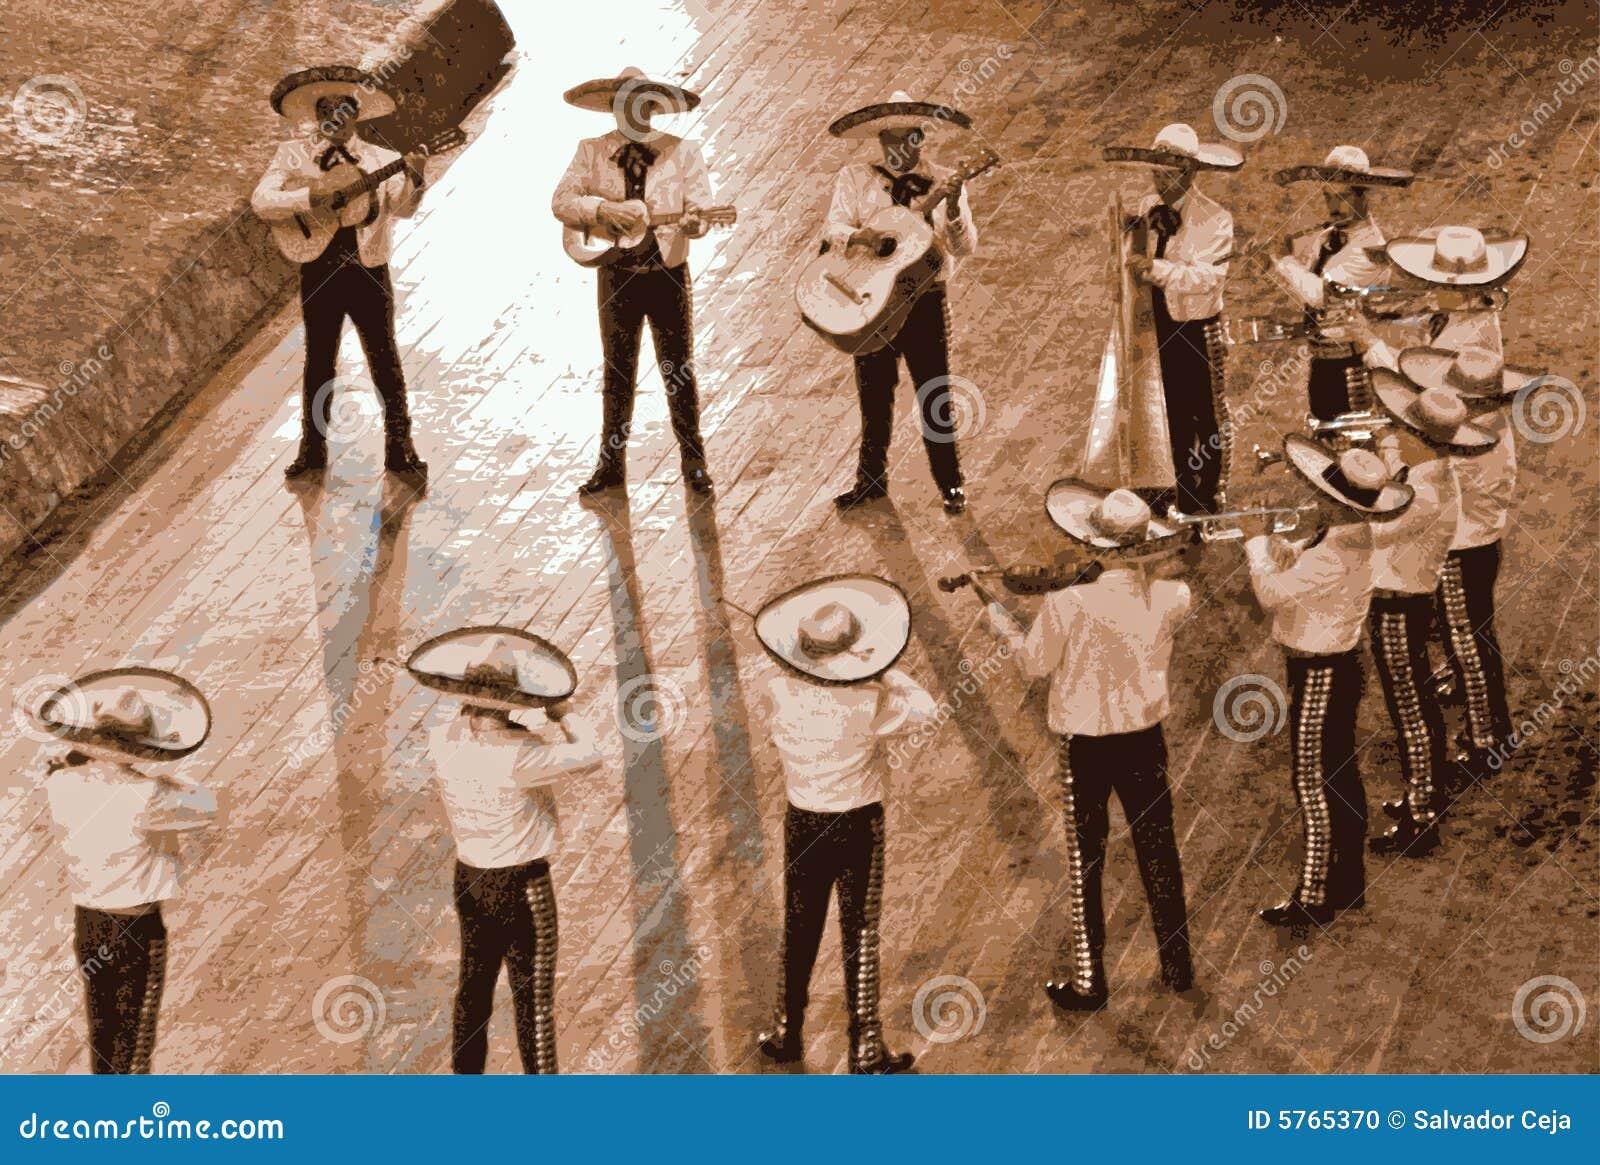 Large mariachi, mexico